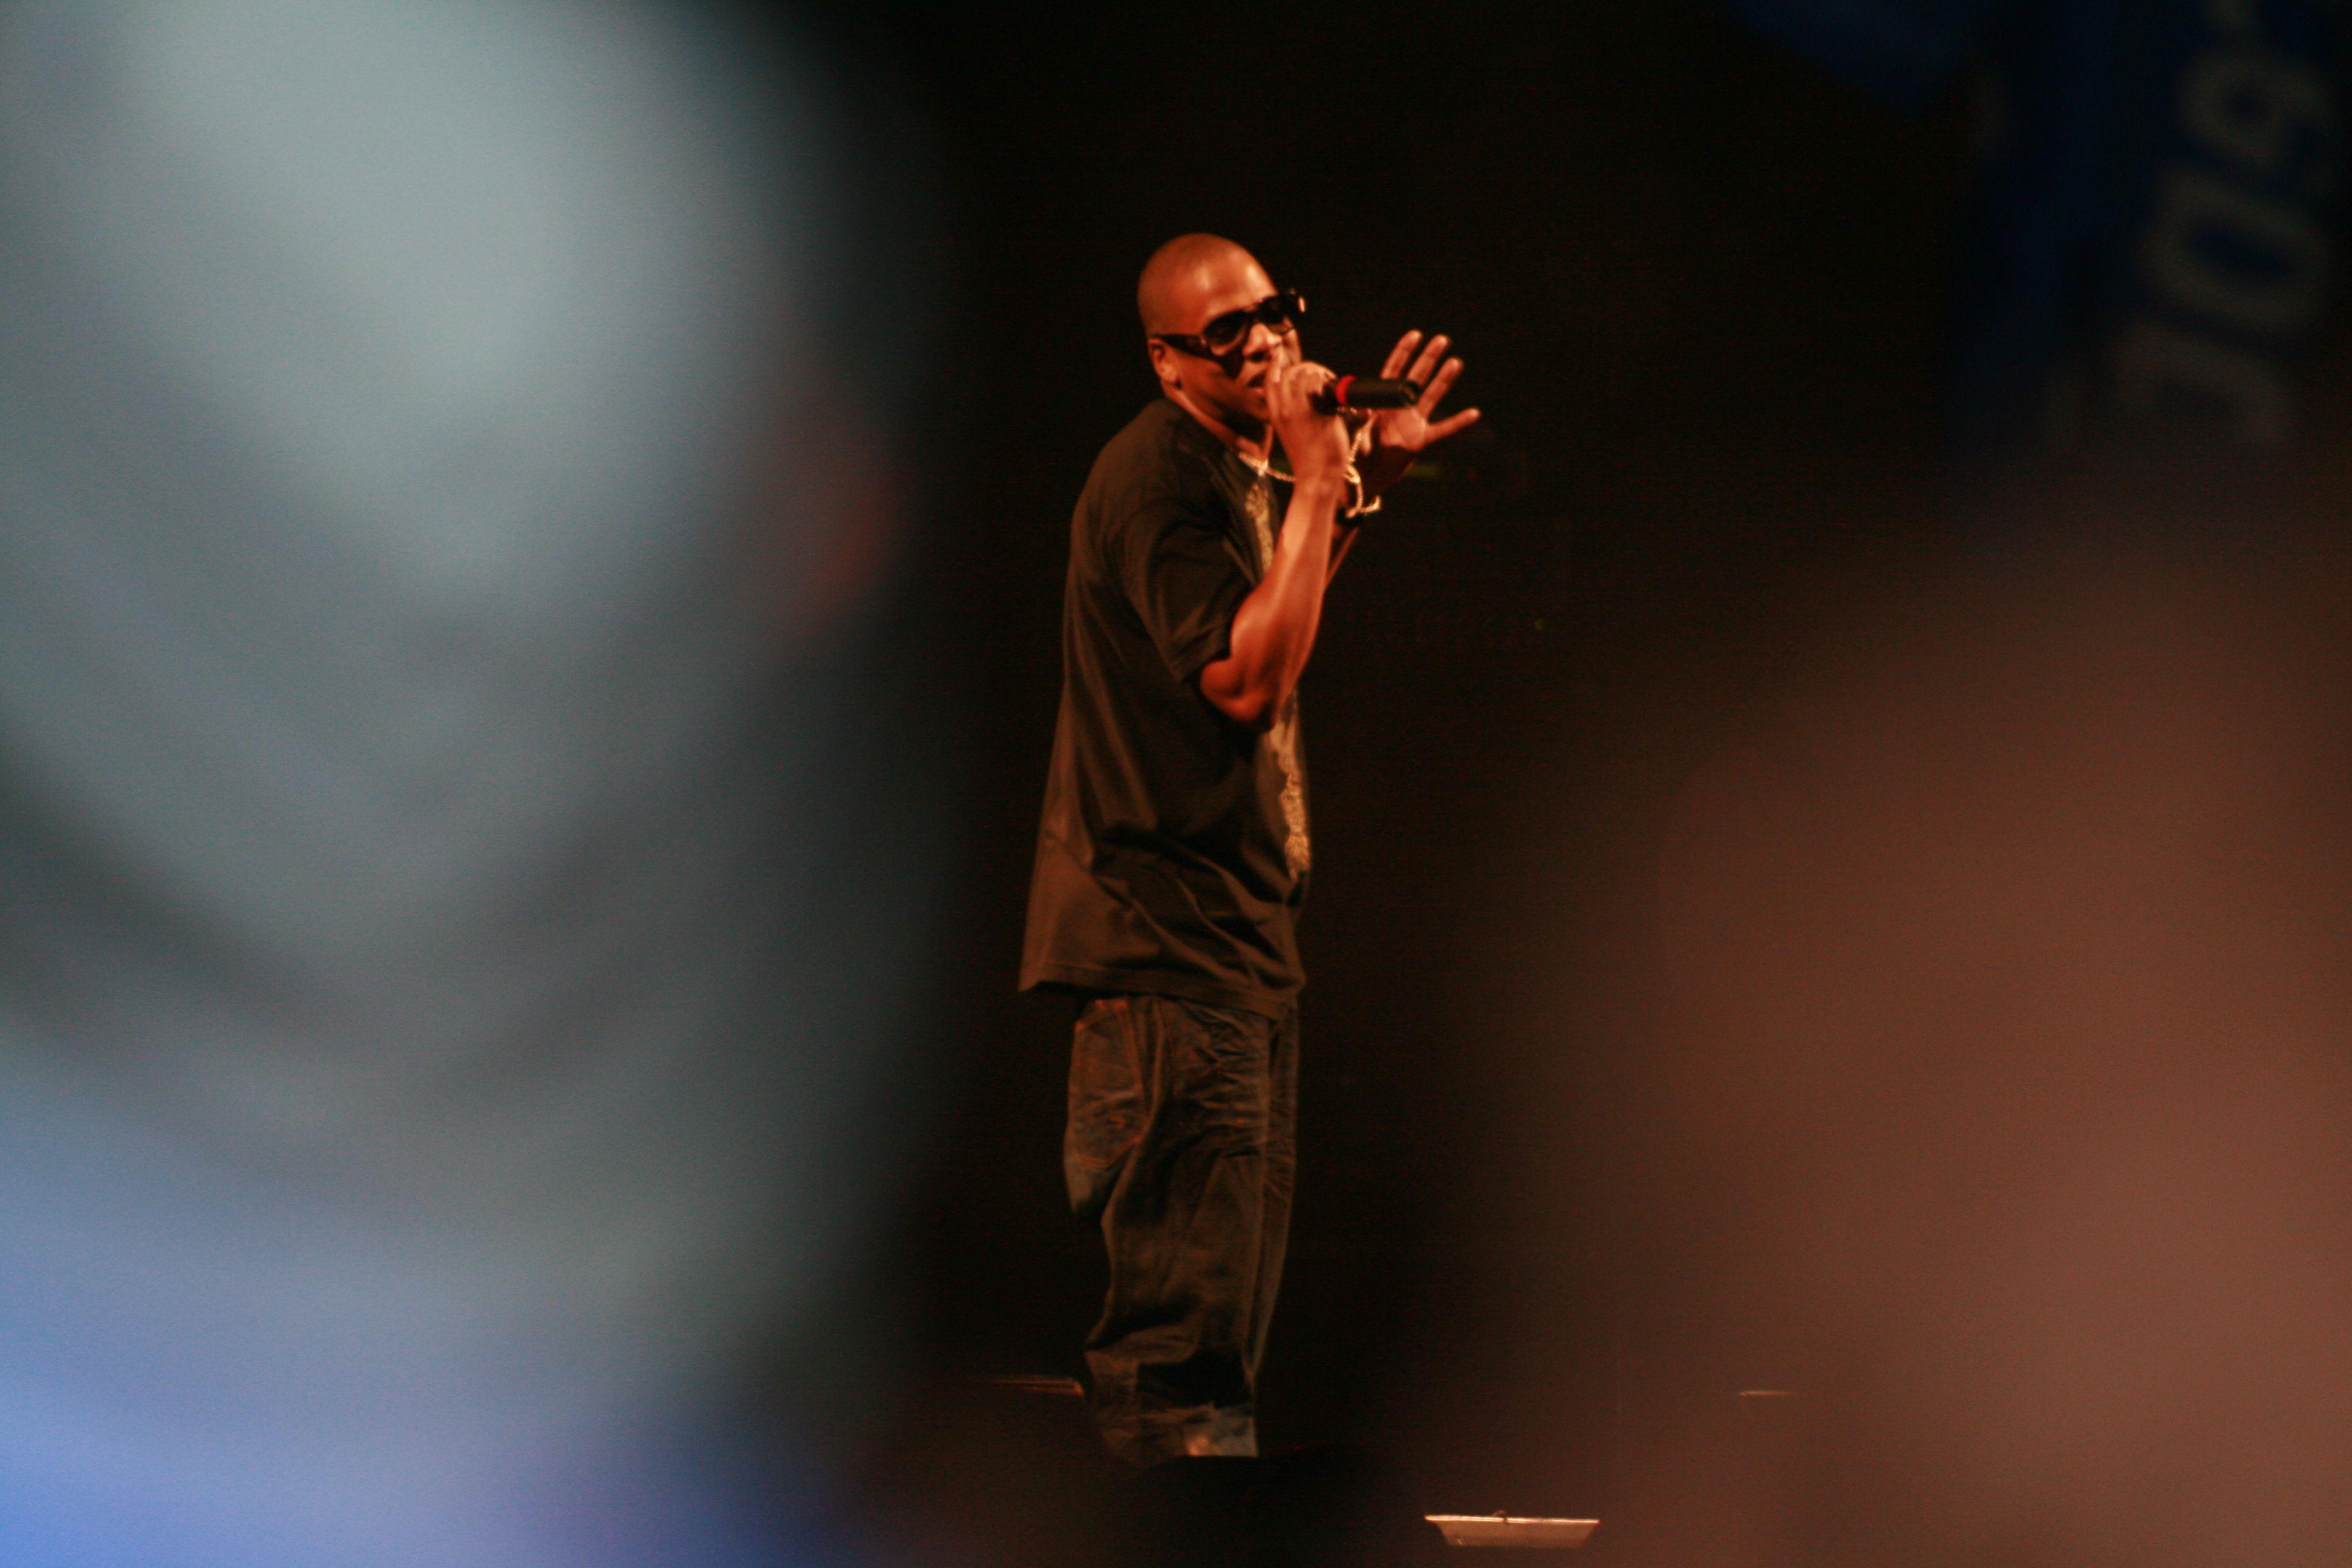 Jay-Z - Foto: Nealwhitehousepiper - (Bron: Wikimedia Commons)